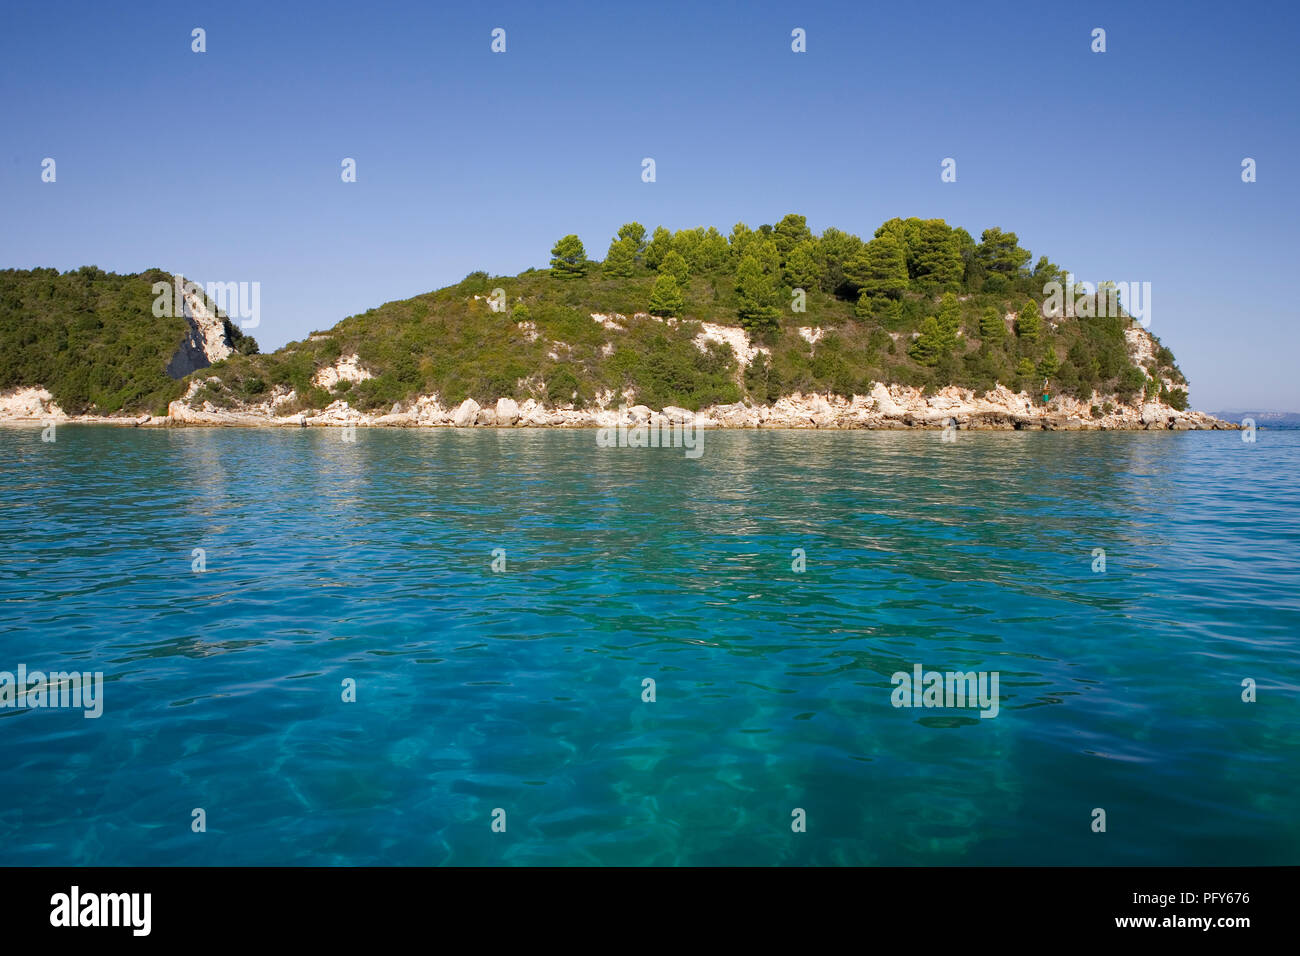 Headland at the entrance to the bay at Lakka, Paxos, Greece Stock Photo